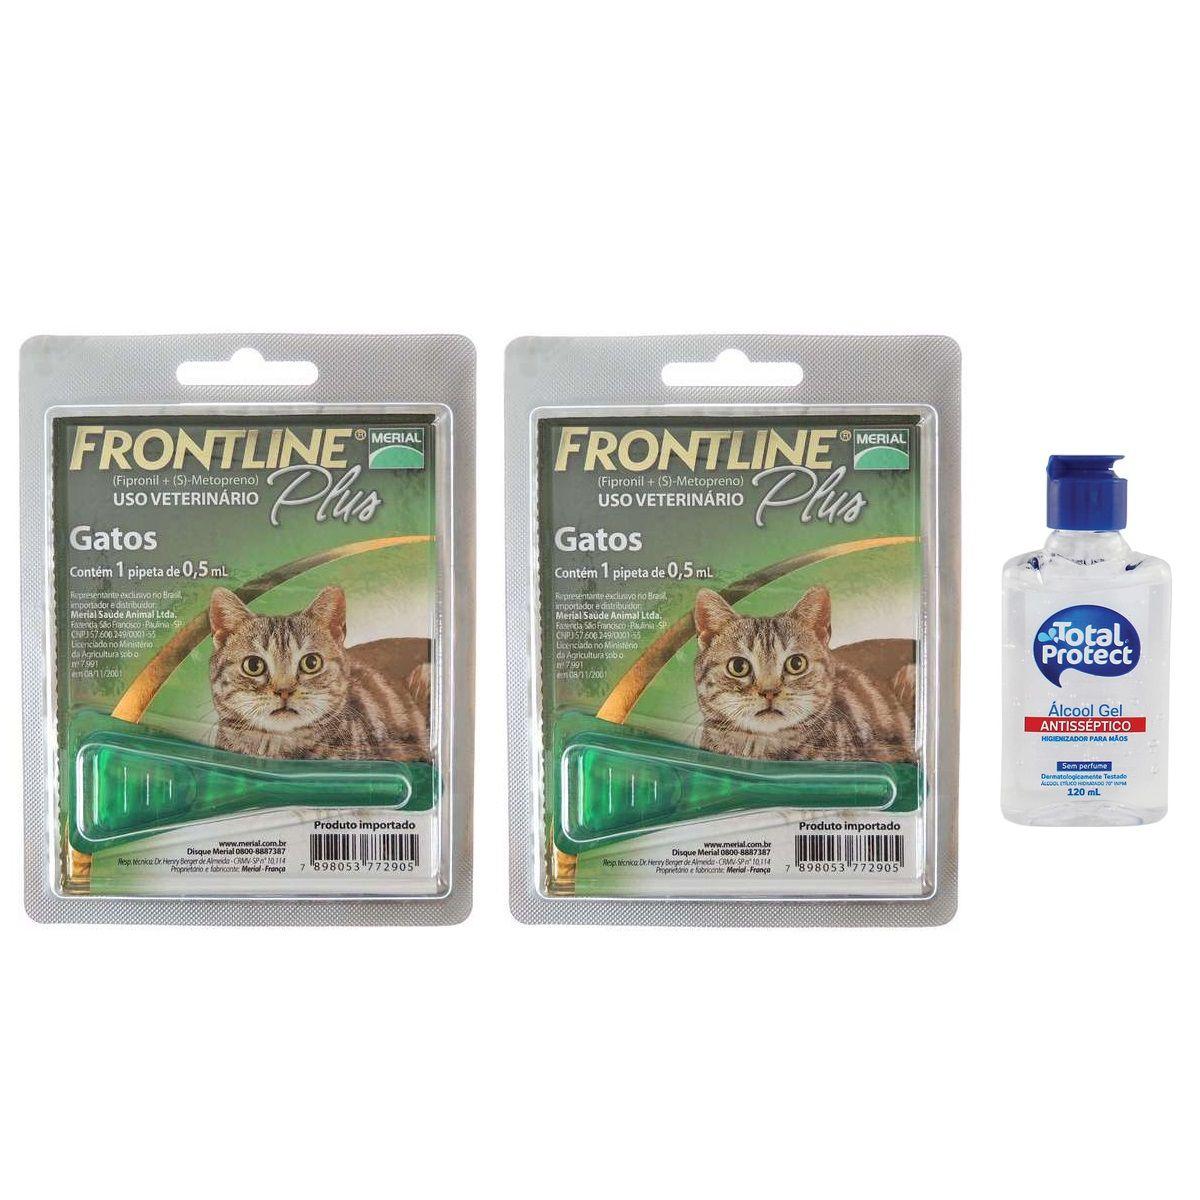 Kit 2 Unidades Antipulgas e Carrapatos Frontline Plus para Gatos - Merial + Brinde Álcool Gel 120ml Total Protect